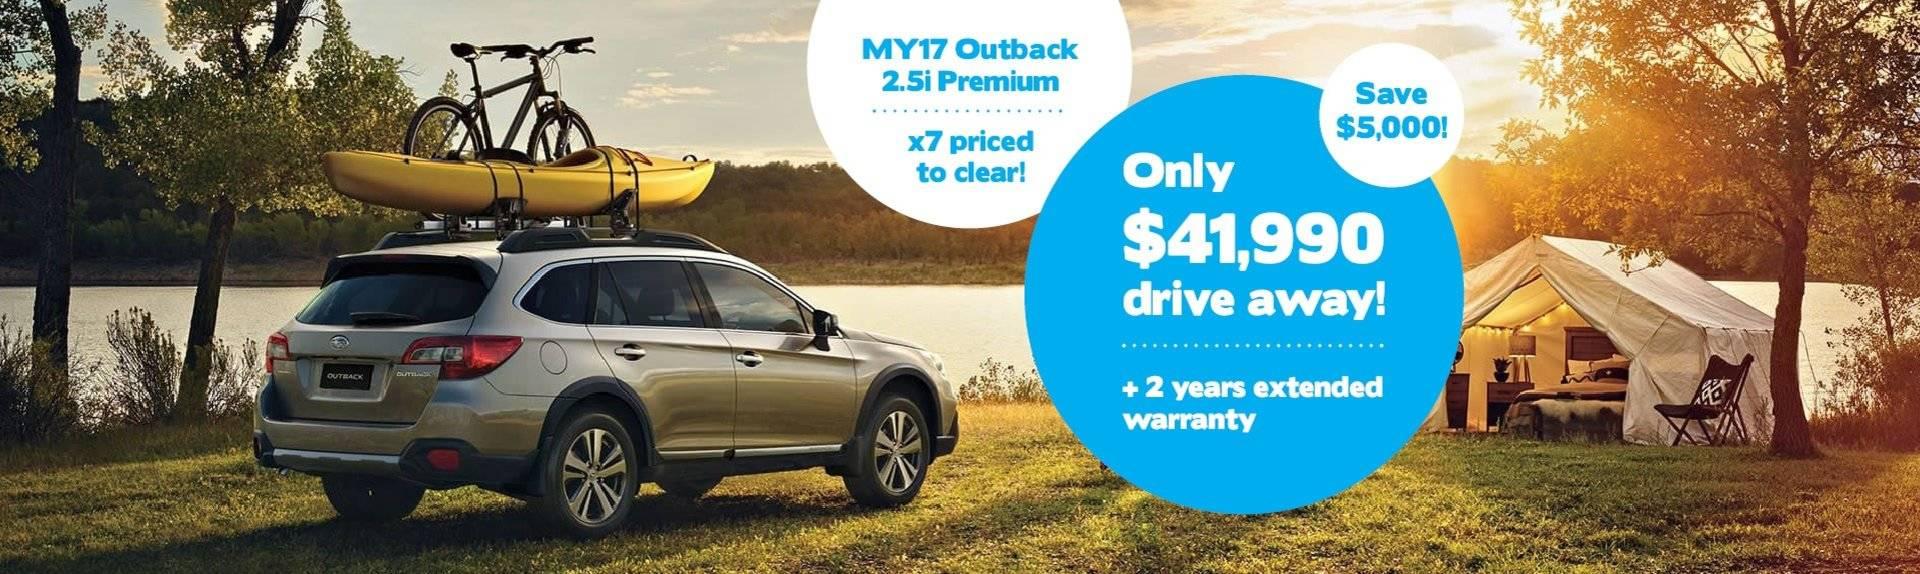 Hunter Subaru Outback Clearance